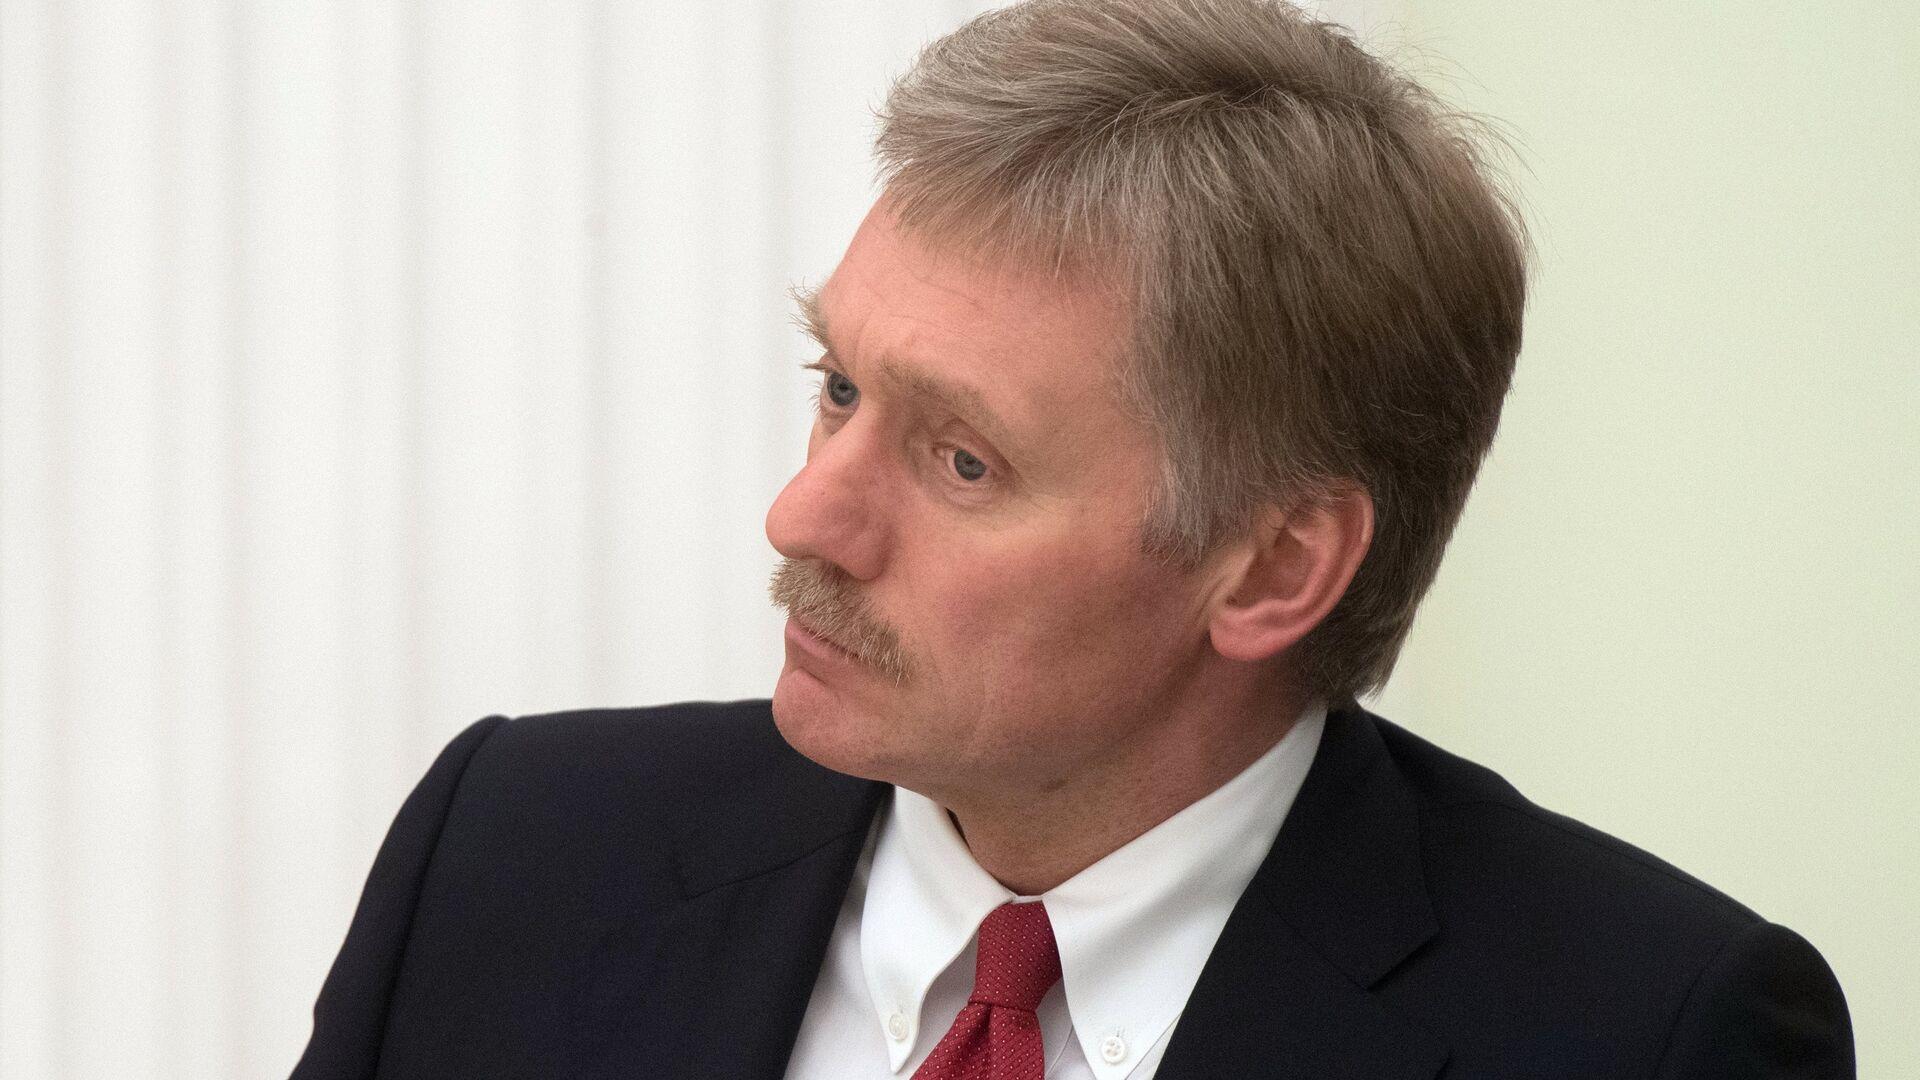 Пресс-секретарь президента РФ Дмитрий Песков - РИА Новости, 1920, 29.10.2020